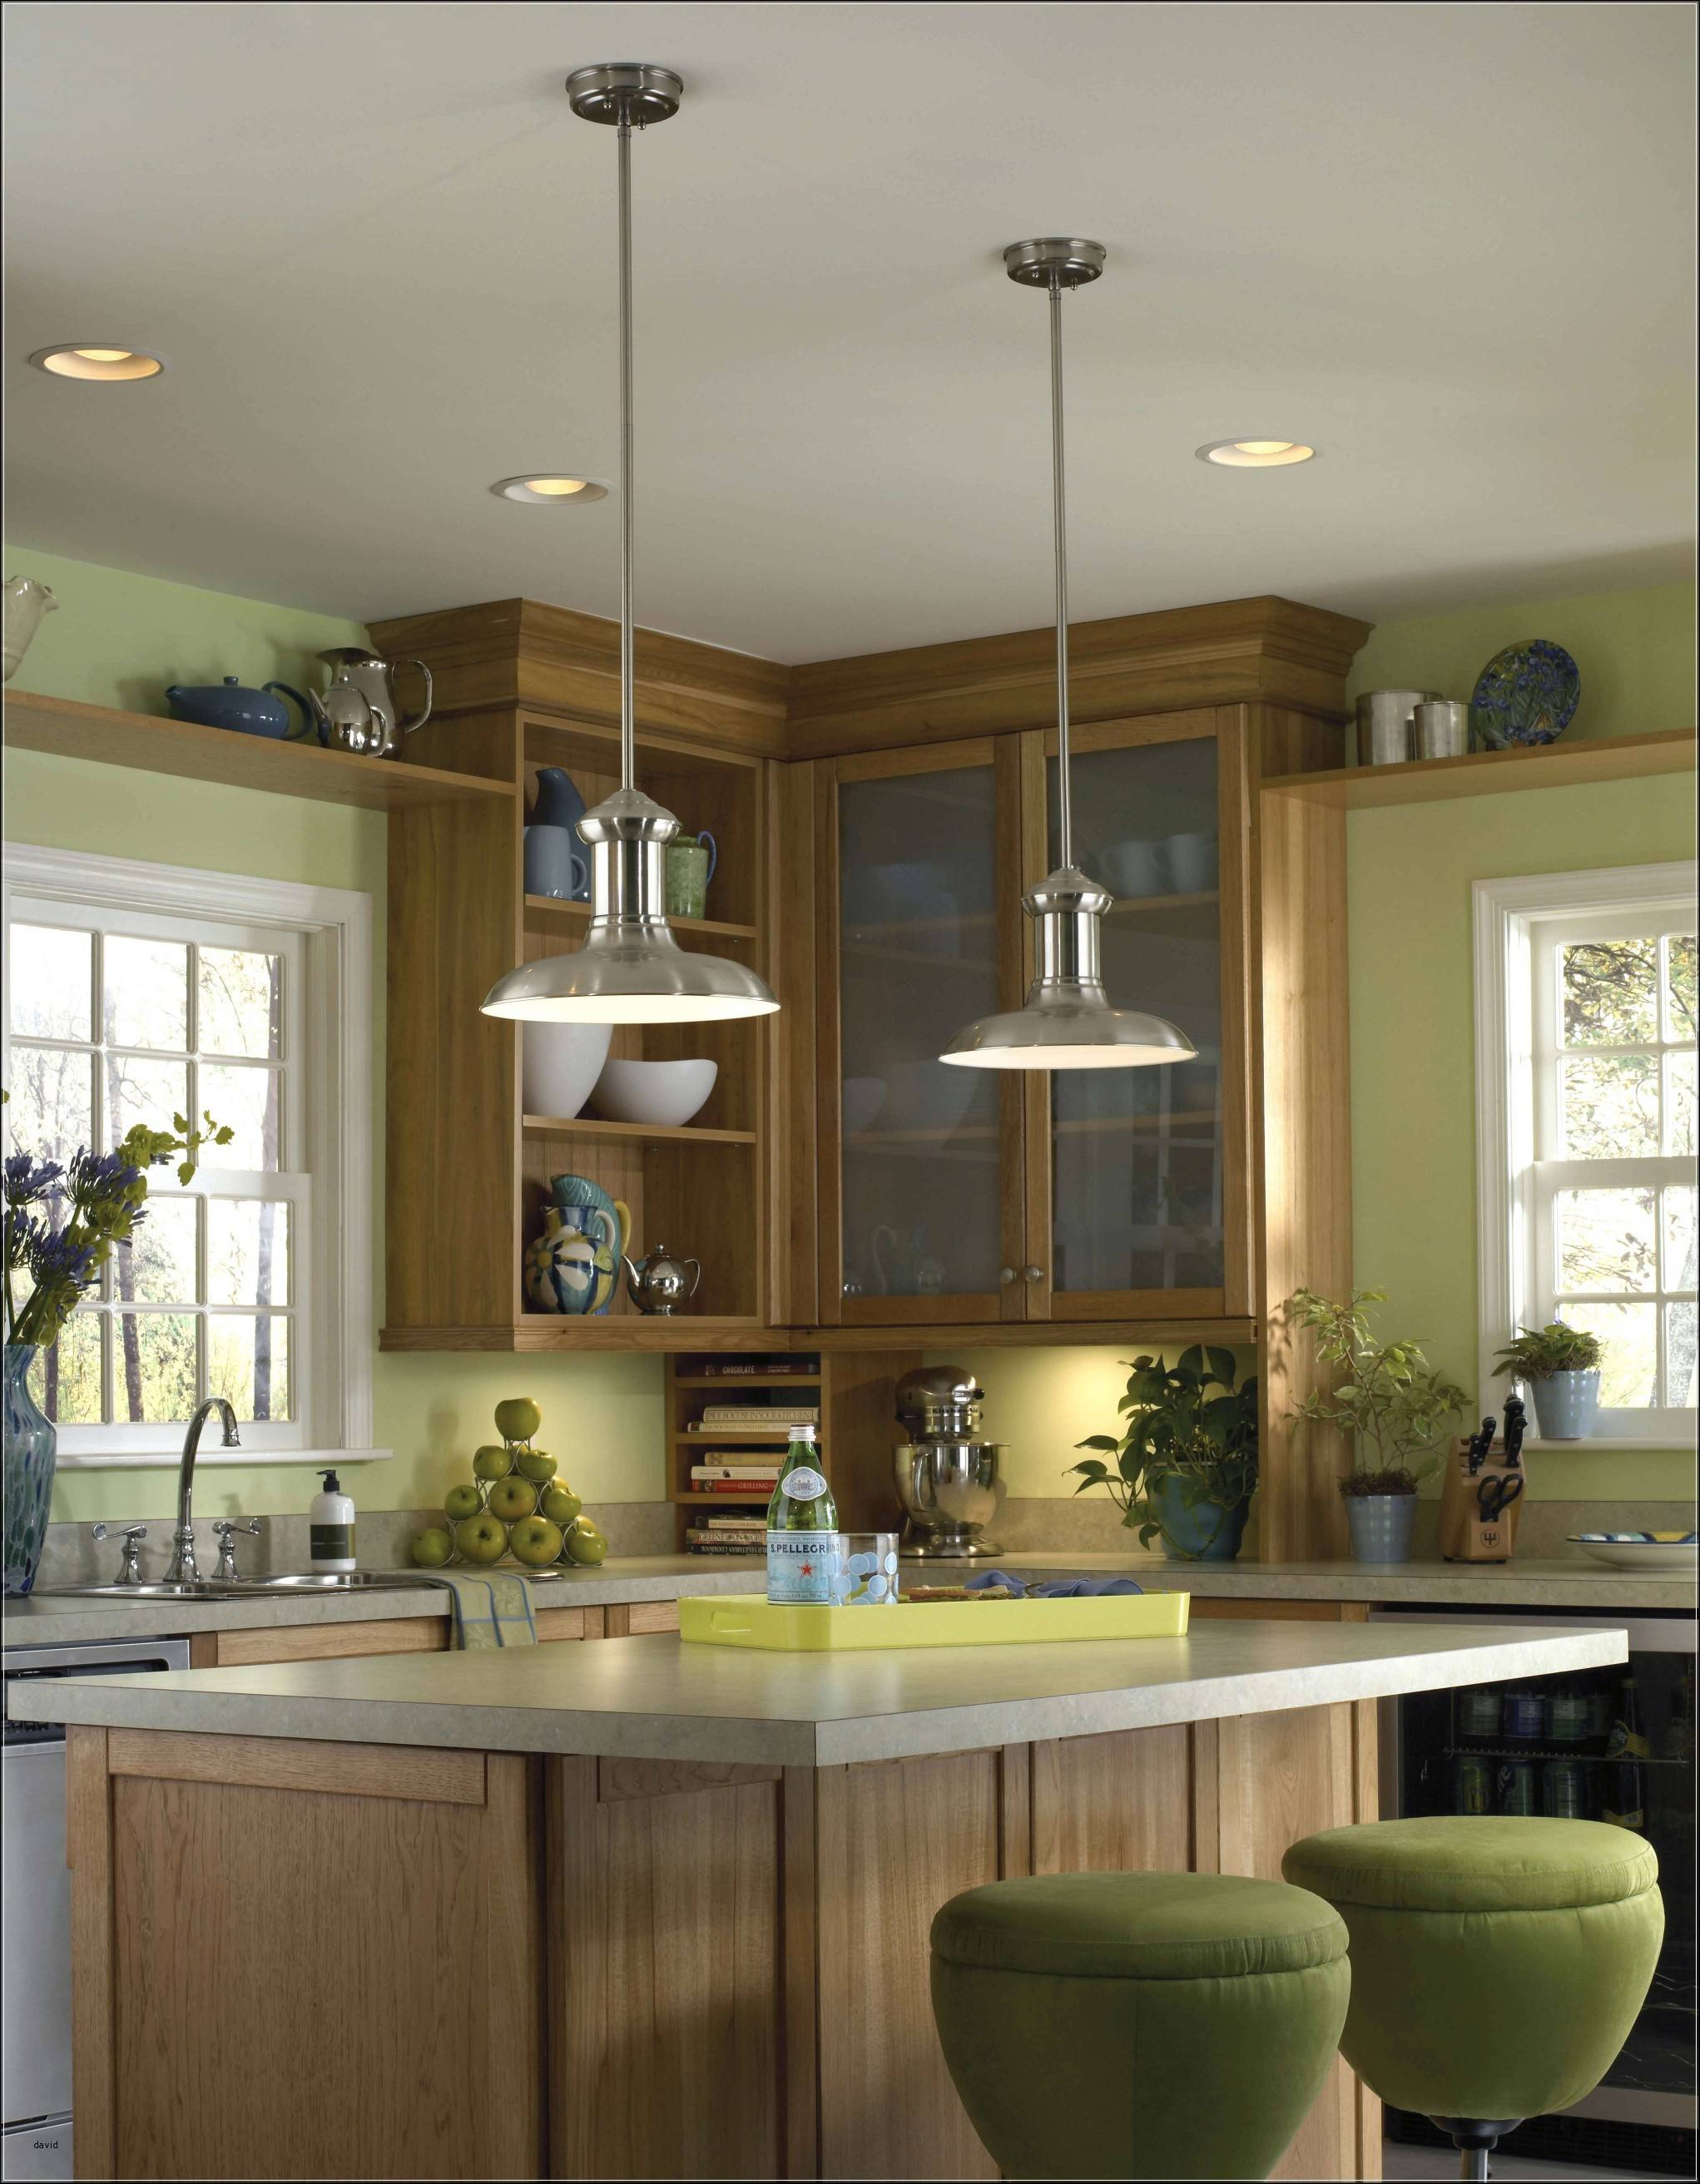 led pendant lights for kitchen island fresh great kitchen cieling lights of led pendant lights for kitchen island 1